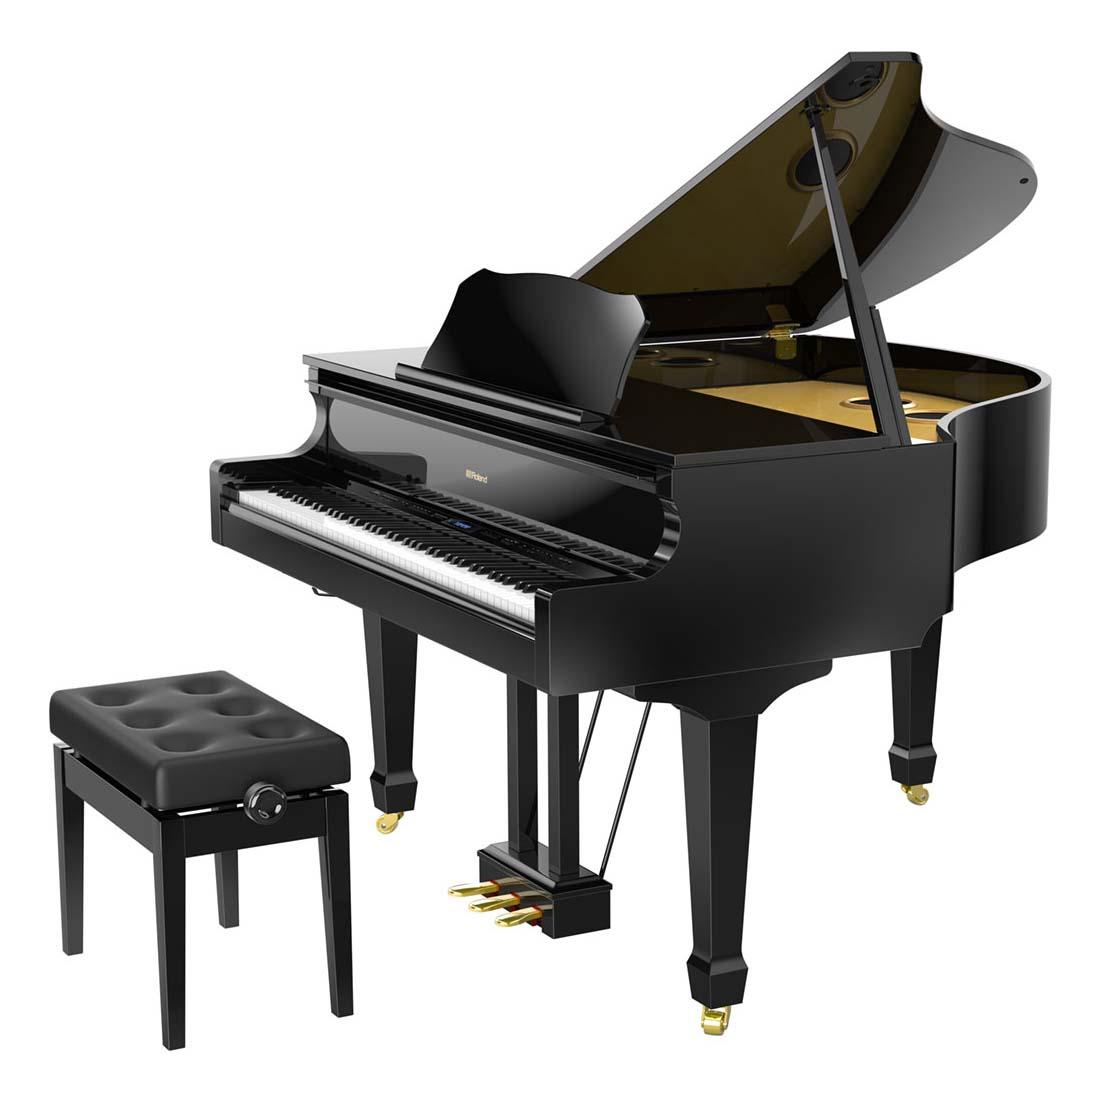 Roland GP609 Digital Grand Piano product display